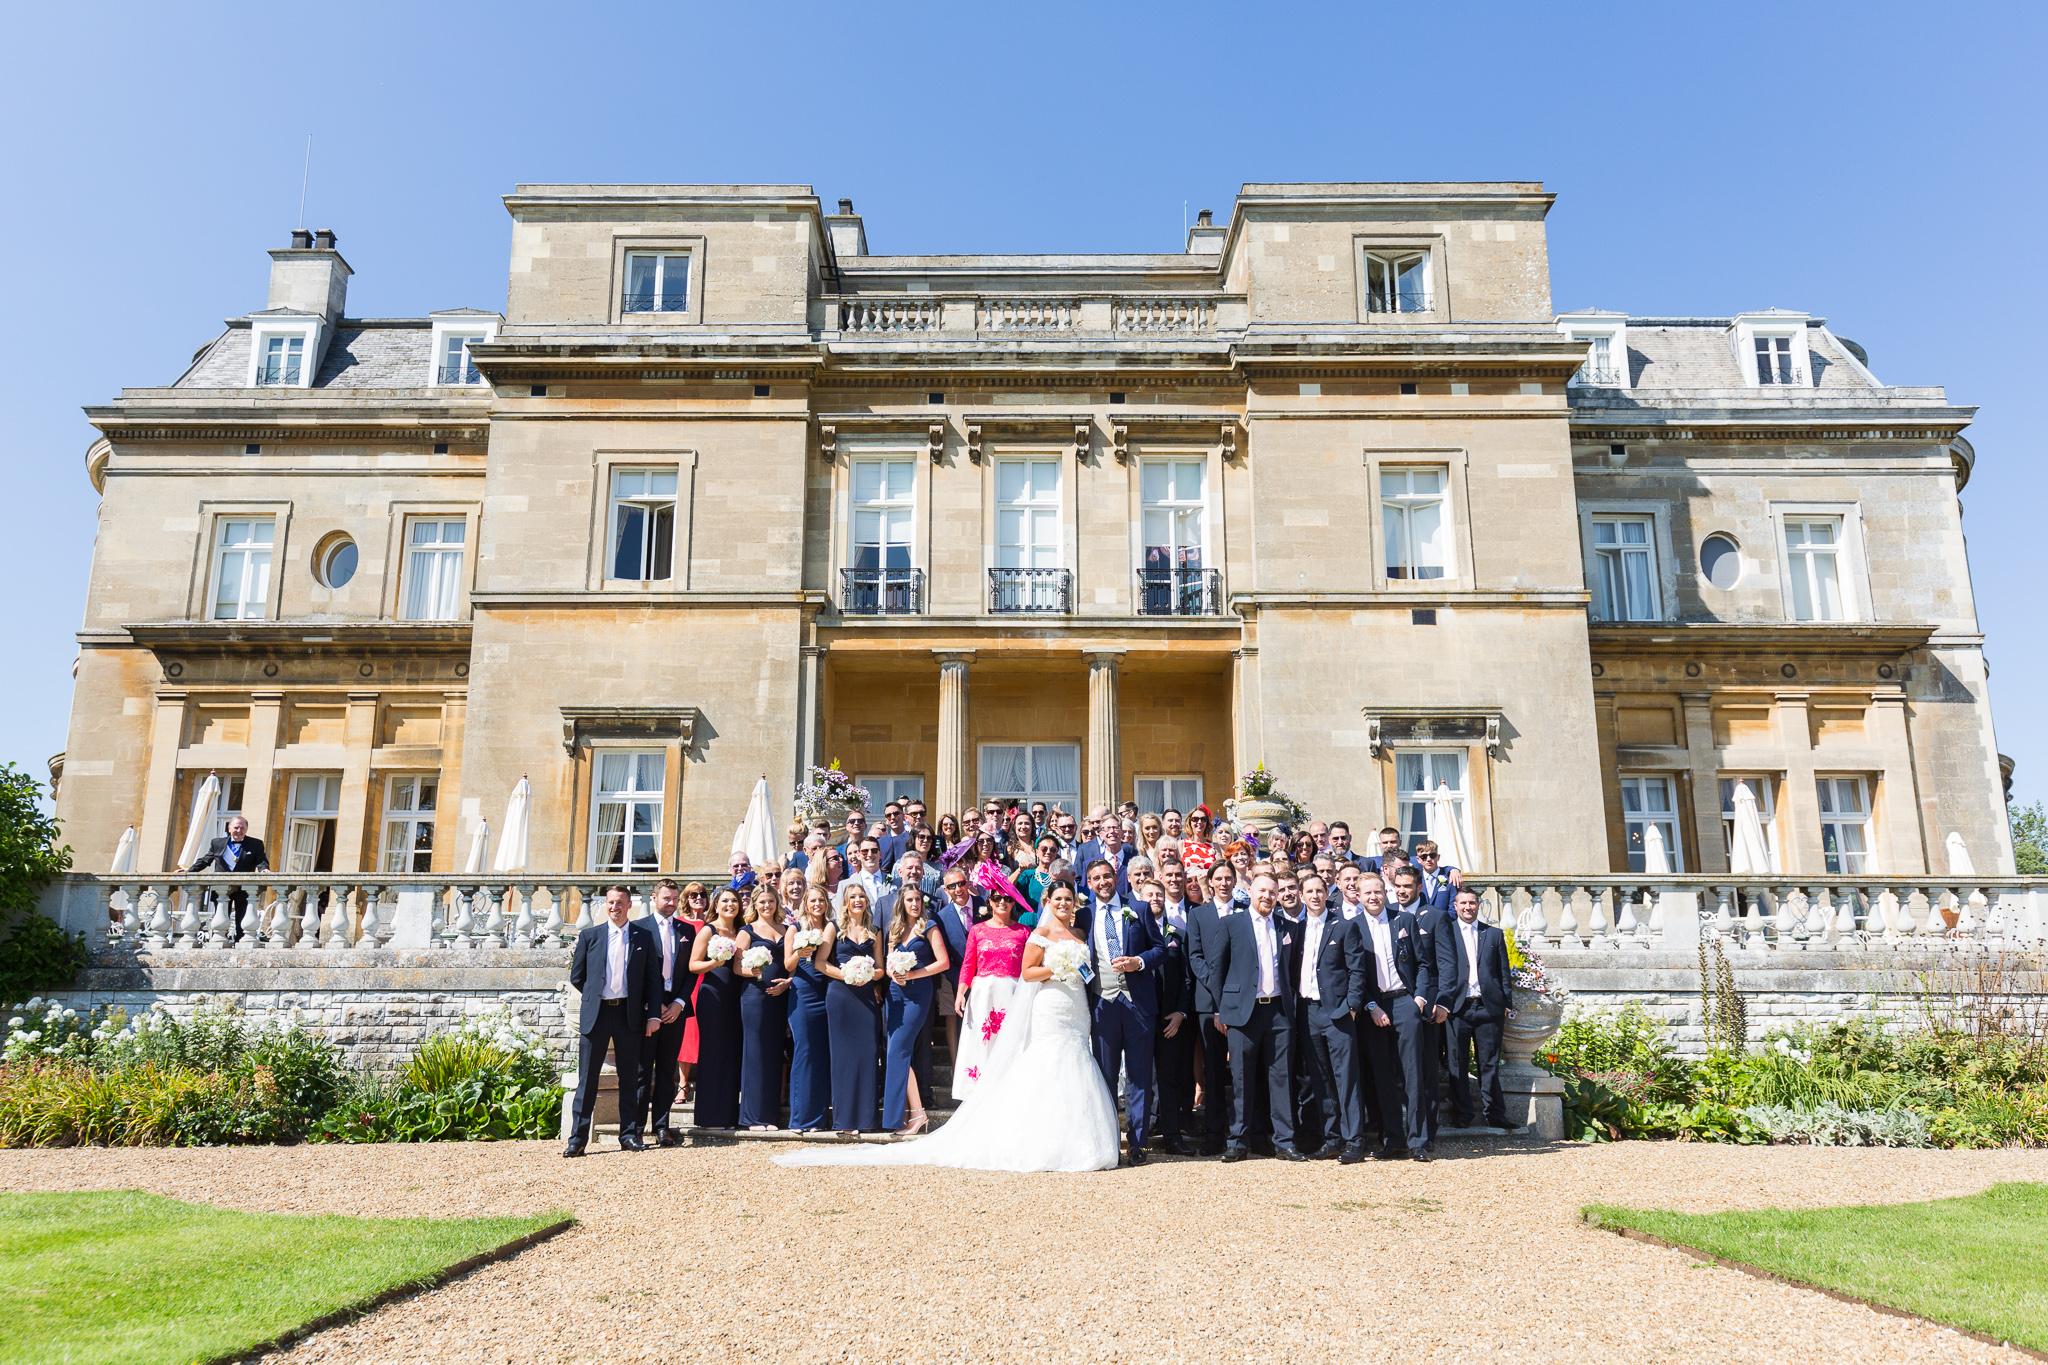 Wedding_Group_Luton_Hoo_natural_wedding_photography_Rachel_Thornhill_Photographer